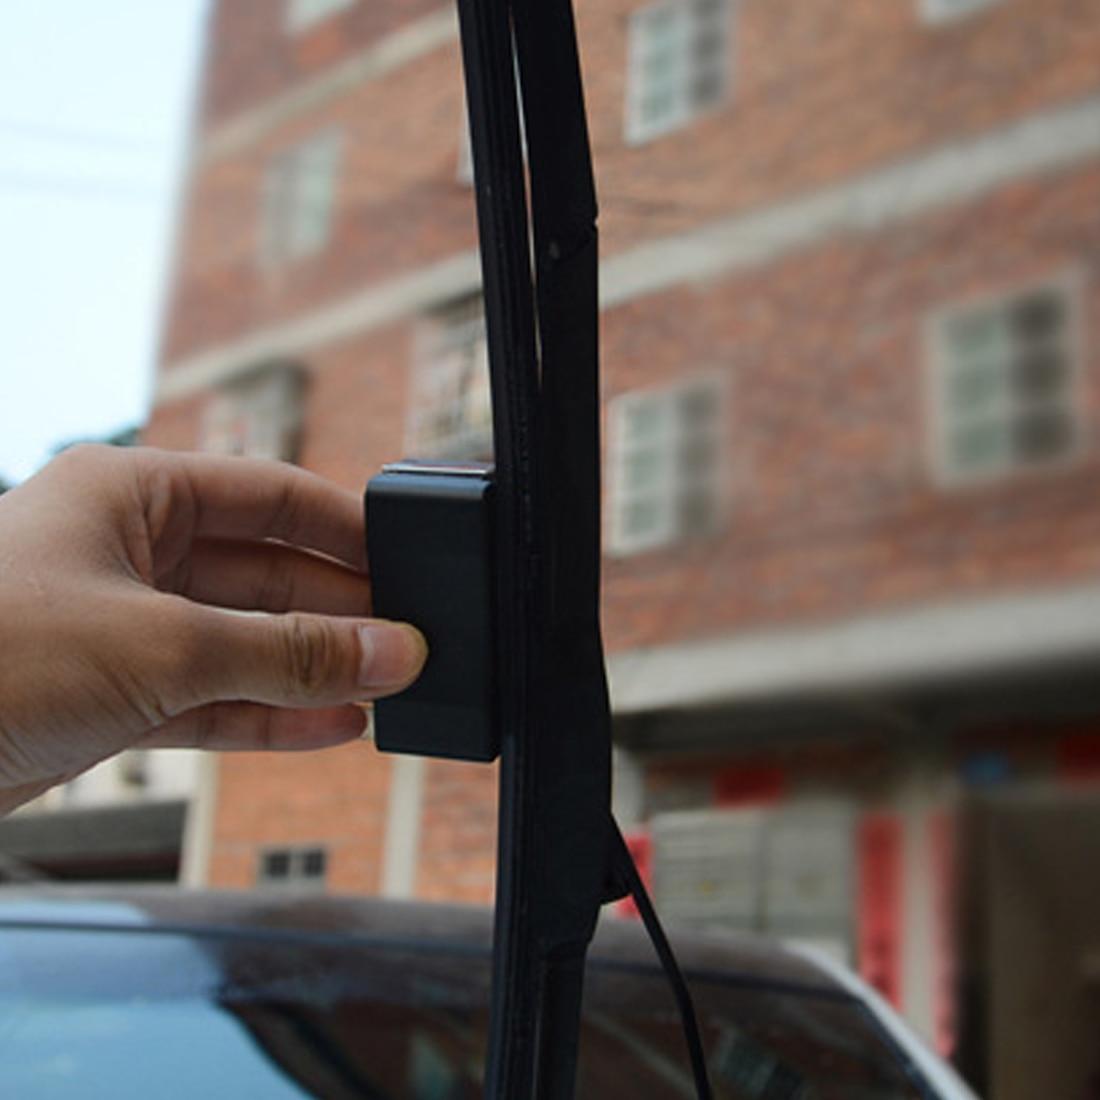 CAR-partment Universal Auto Car Vehicle Windshield Wiper Blade Refurbish Repair Tool Cleaner Windshield Scratch Repair Kit